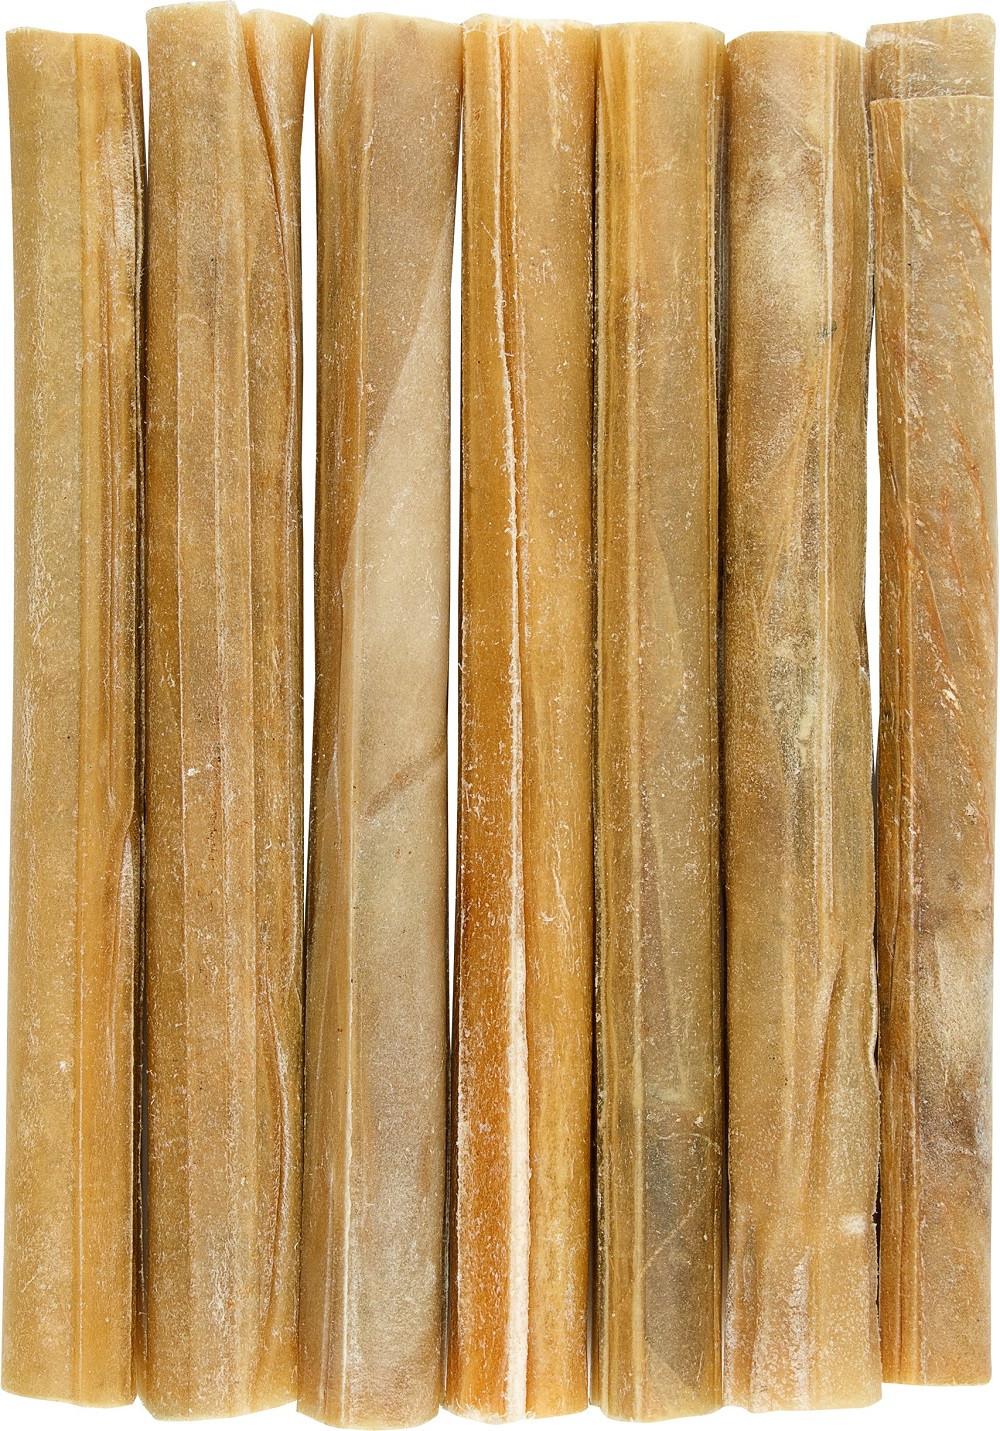 Geperste staven <br>25,5 cm (25 mm) <br>10 st